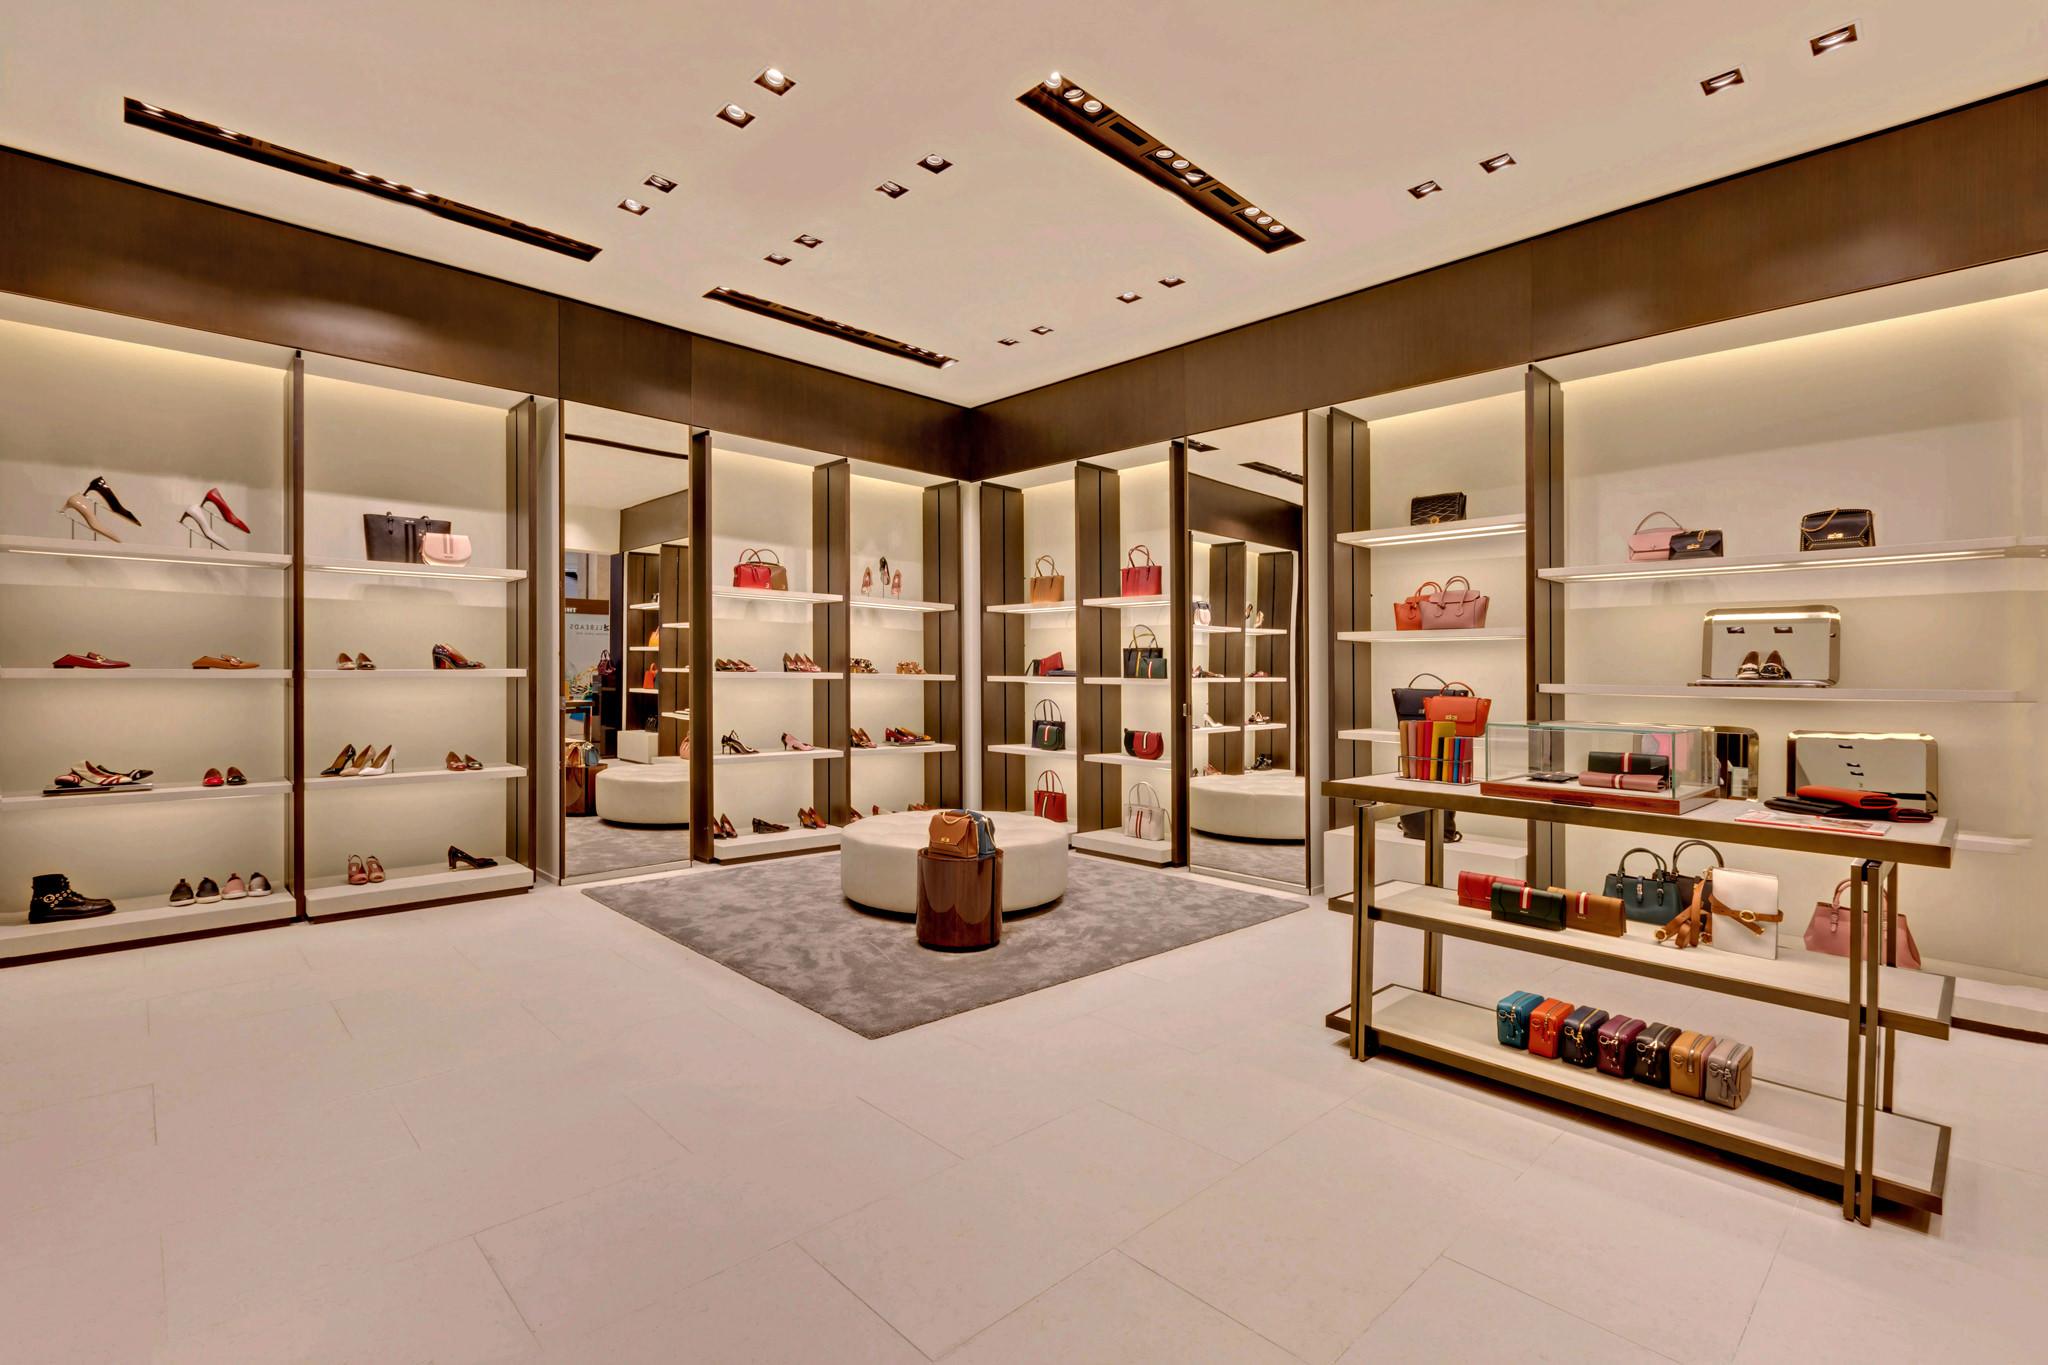 20170721 - Bally - HCM - Commercial - Interior - Store - Retouch 0009.jpg